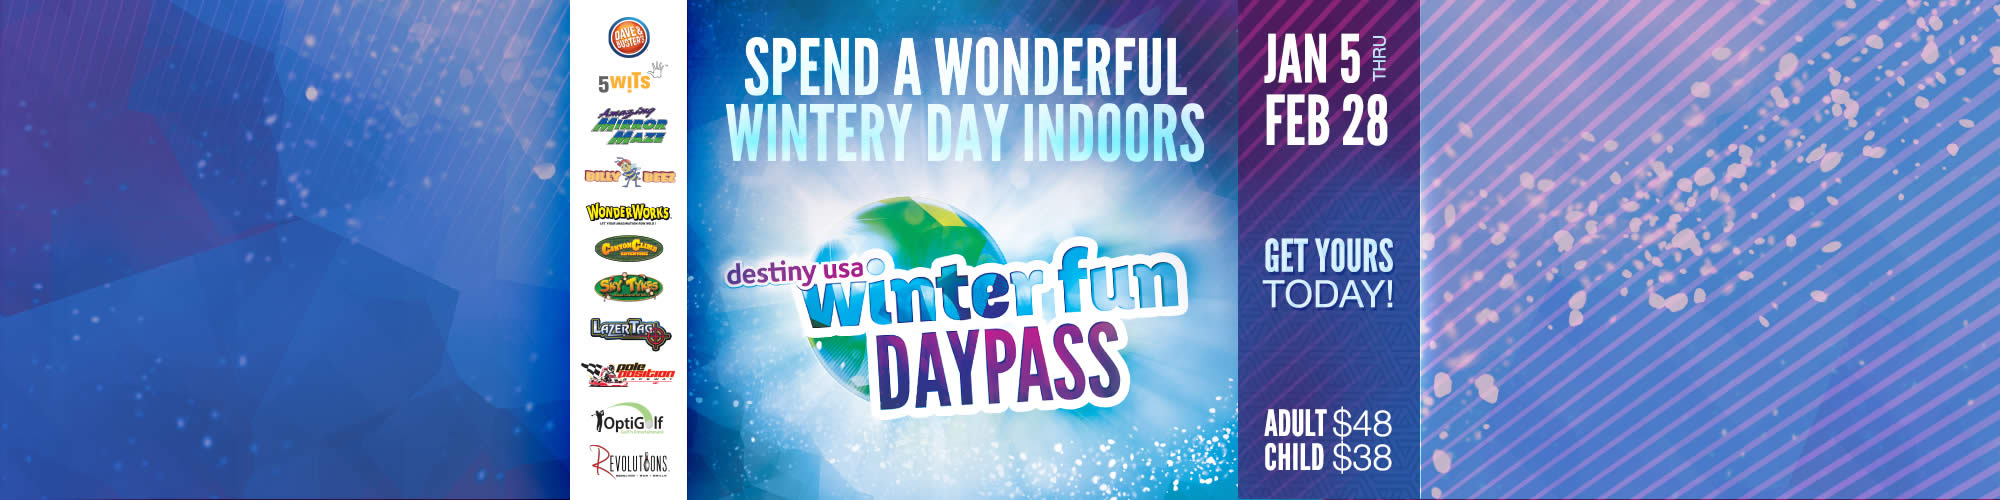 Winter Fun Day Pass